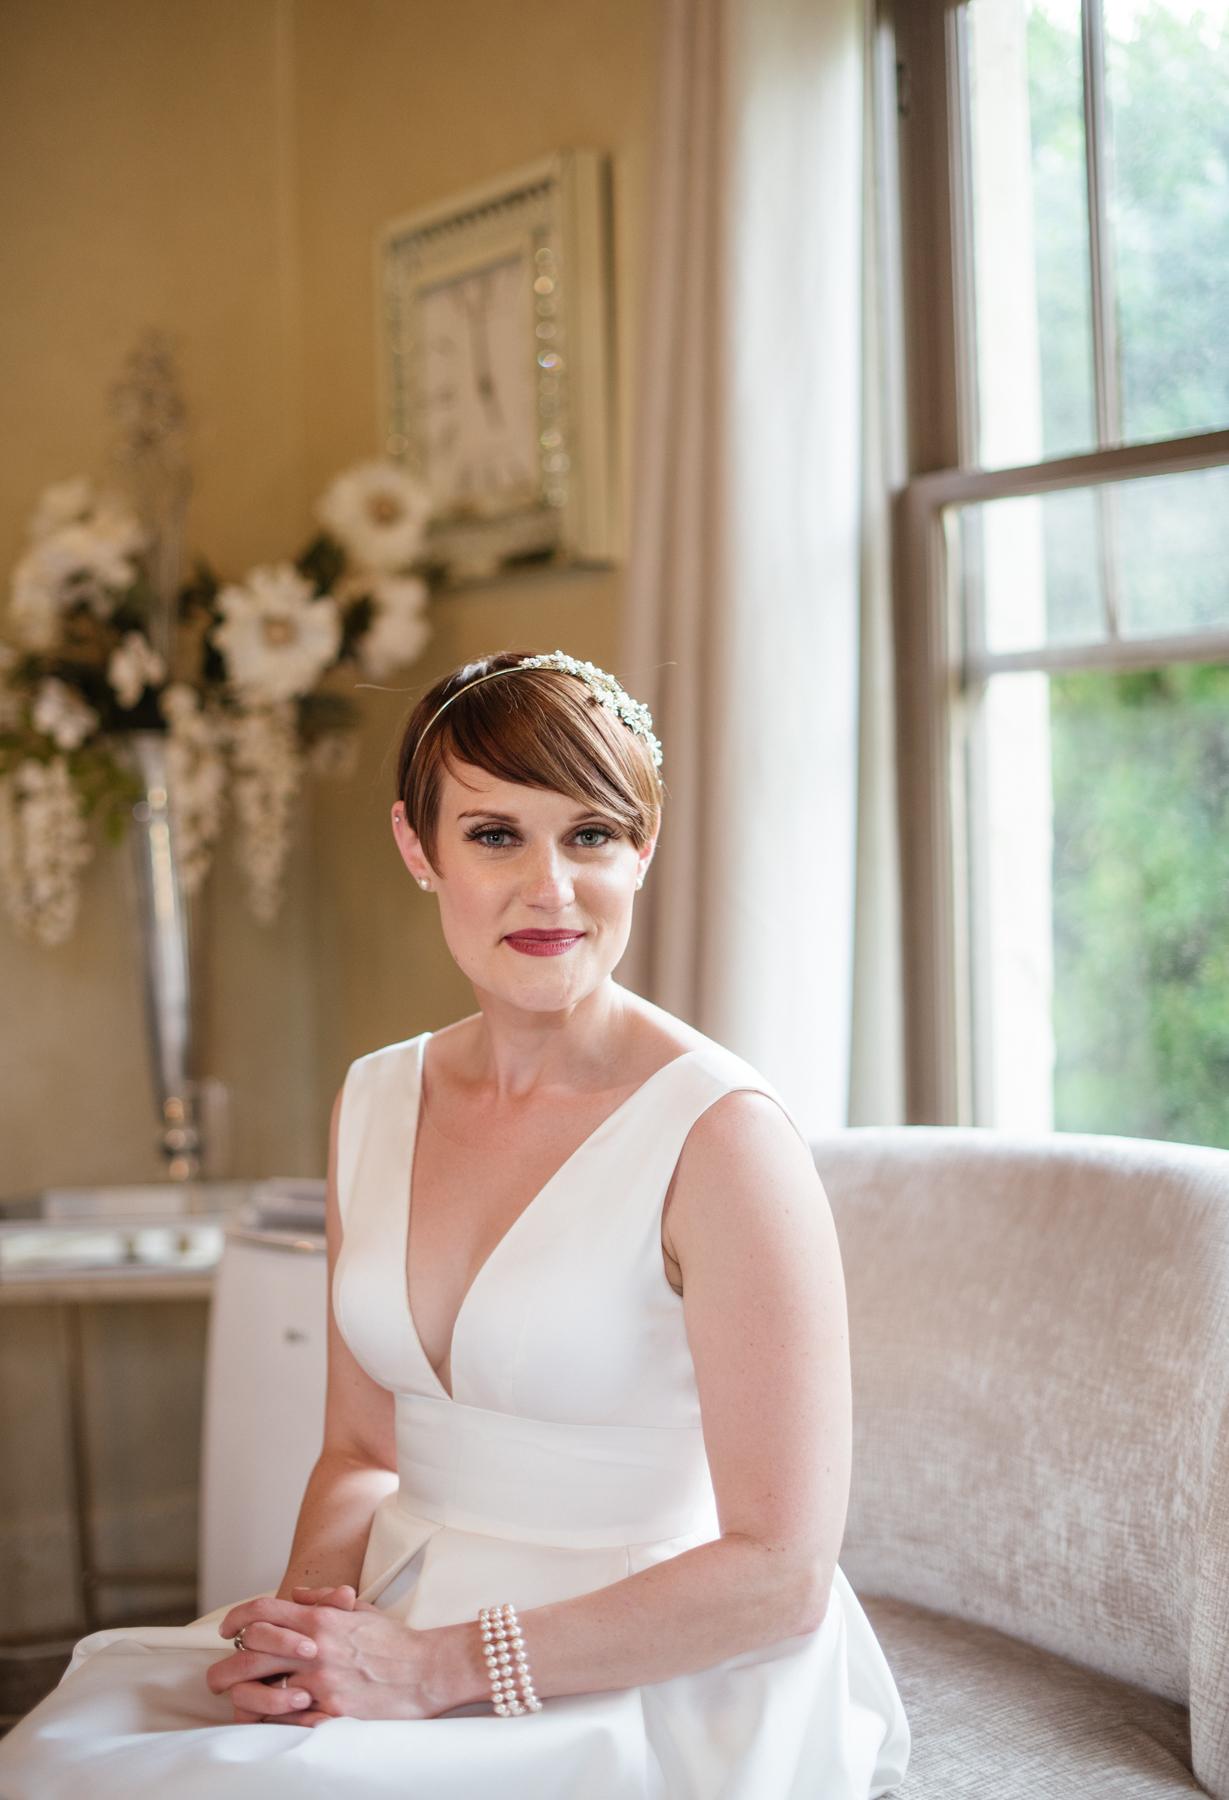 Secret Garden Event Center Wedding - Meredith Amadee Photography-24-2.jpg